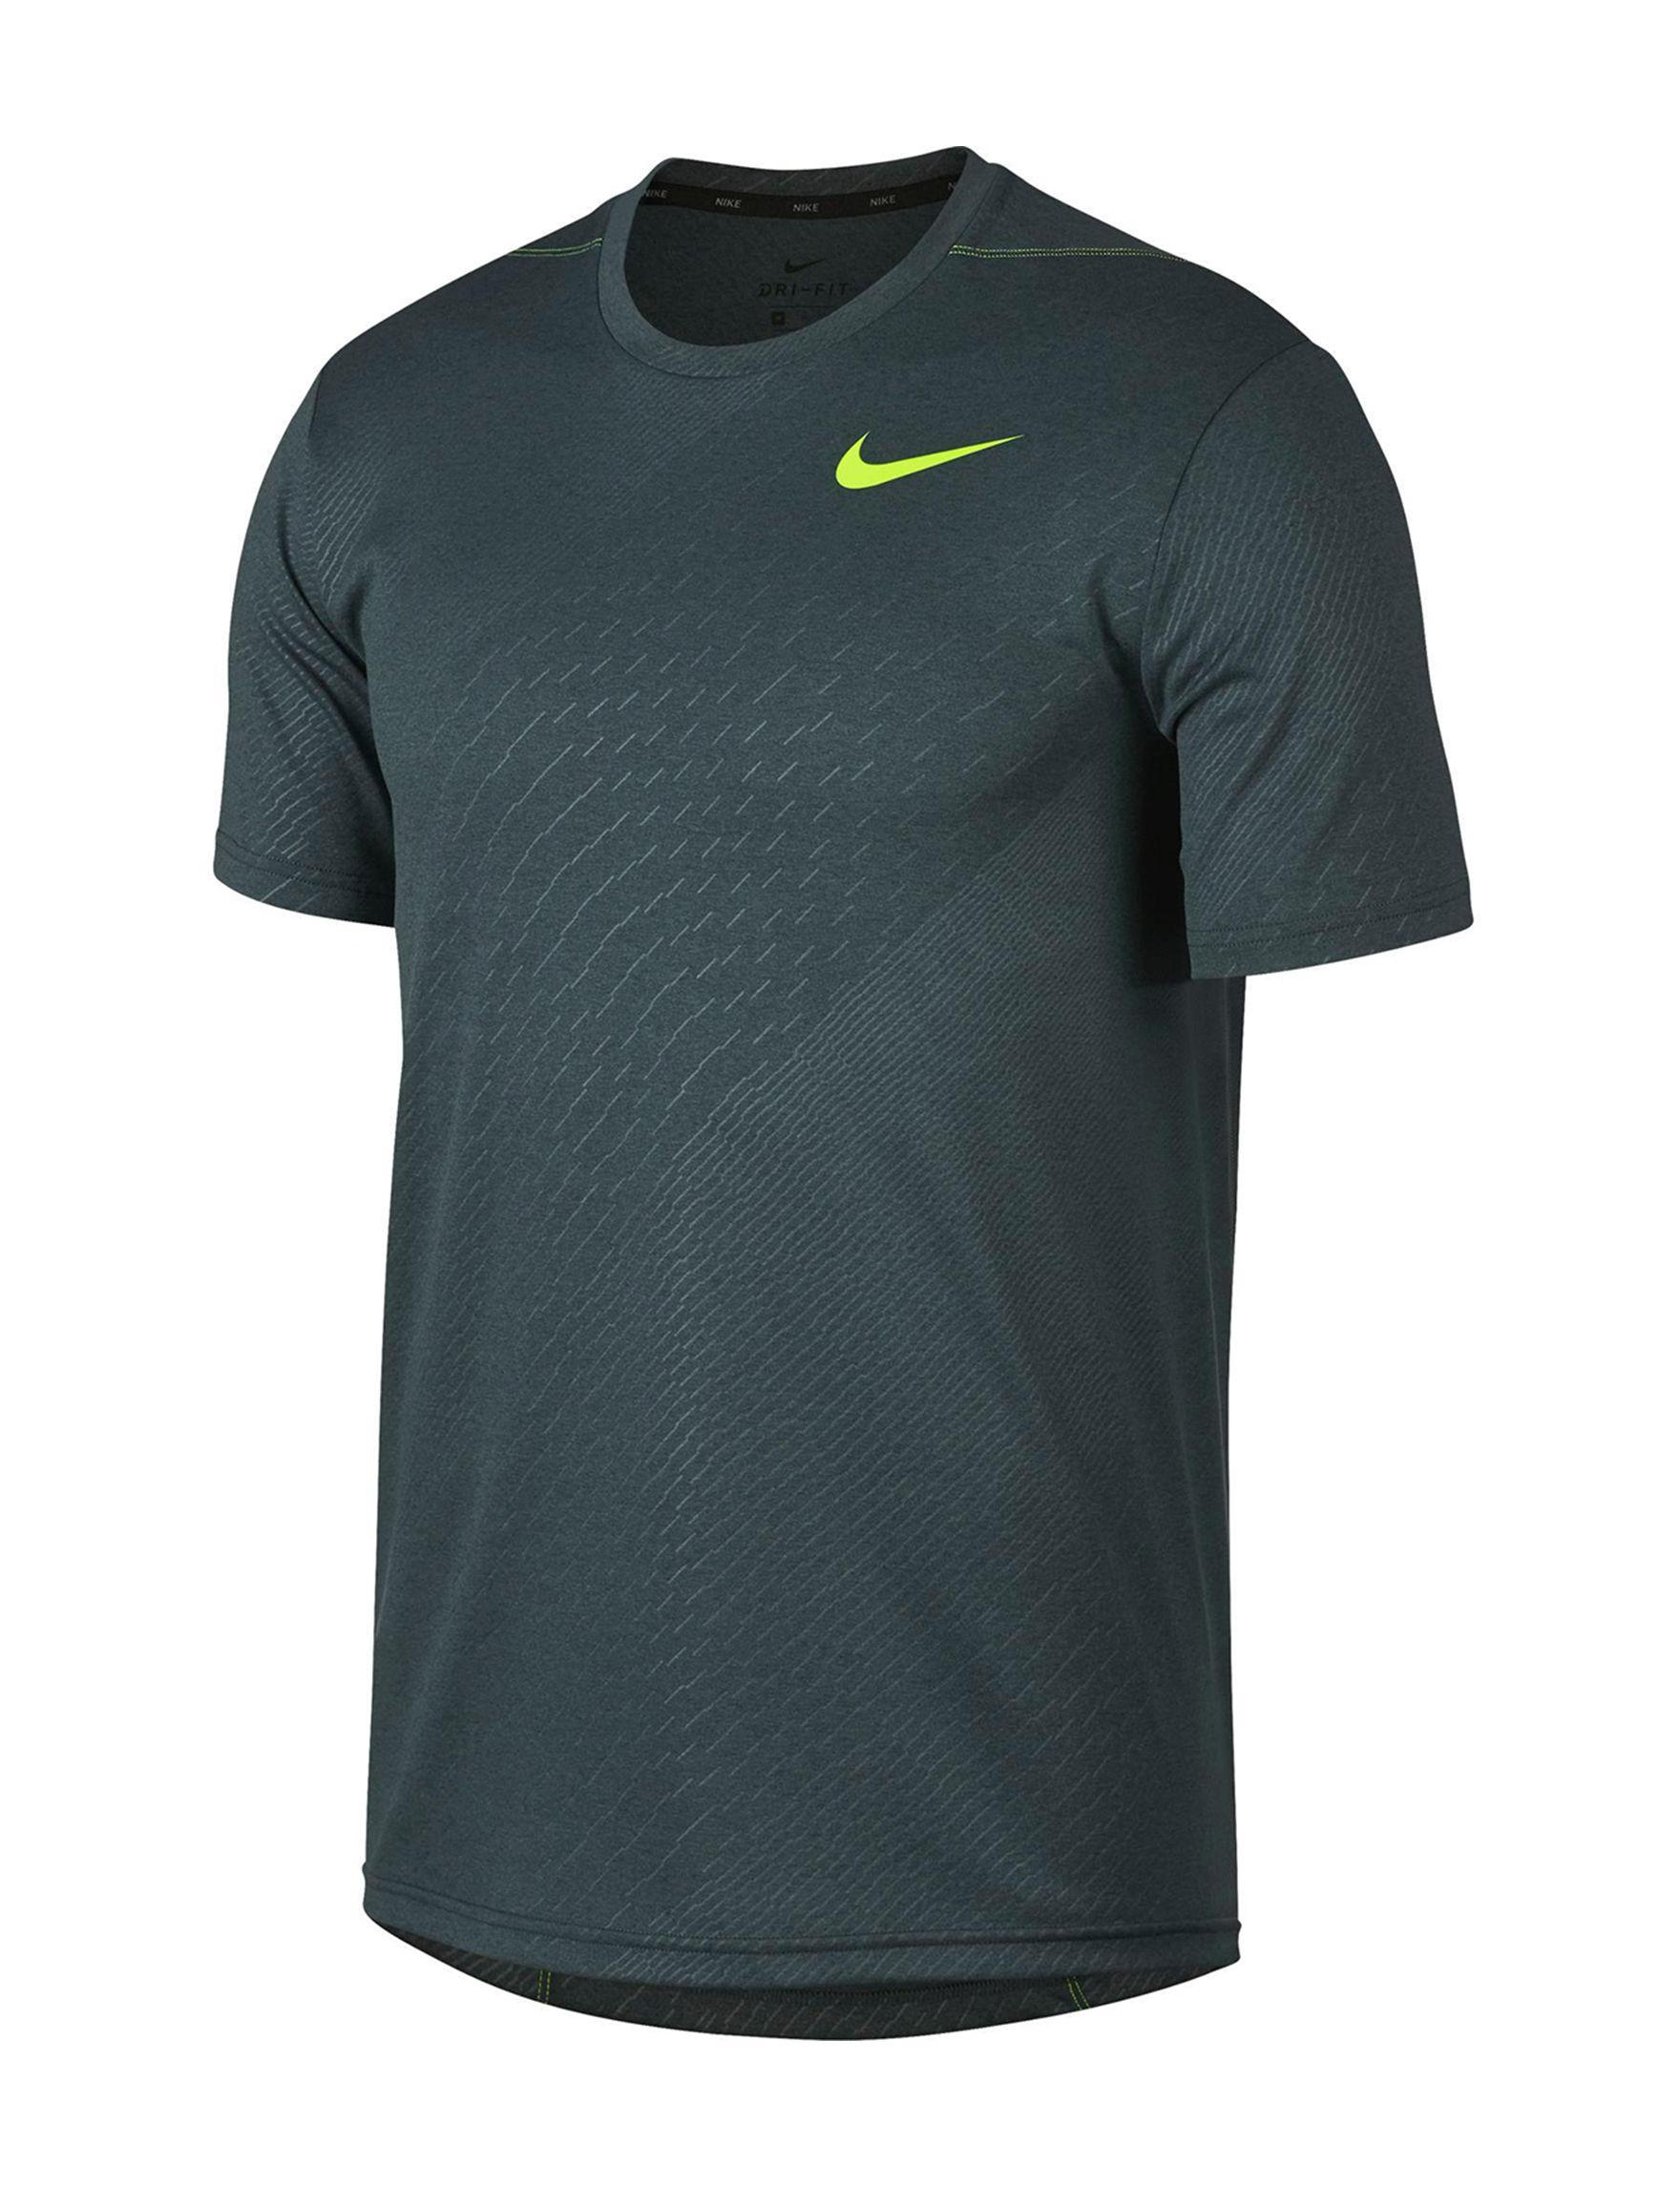 Nike Green Tees & Tanks